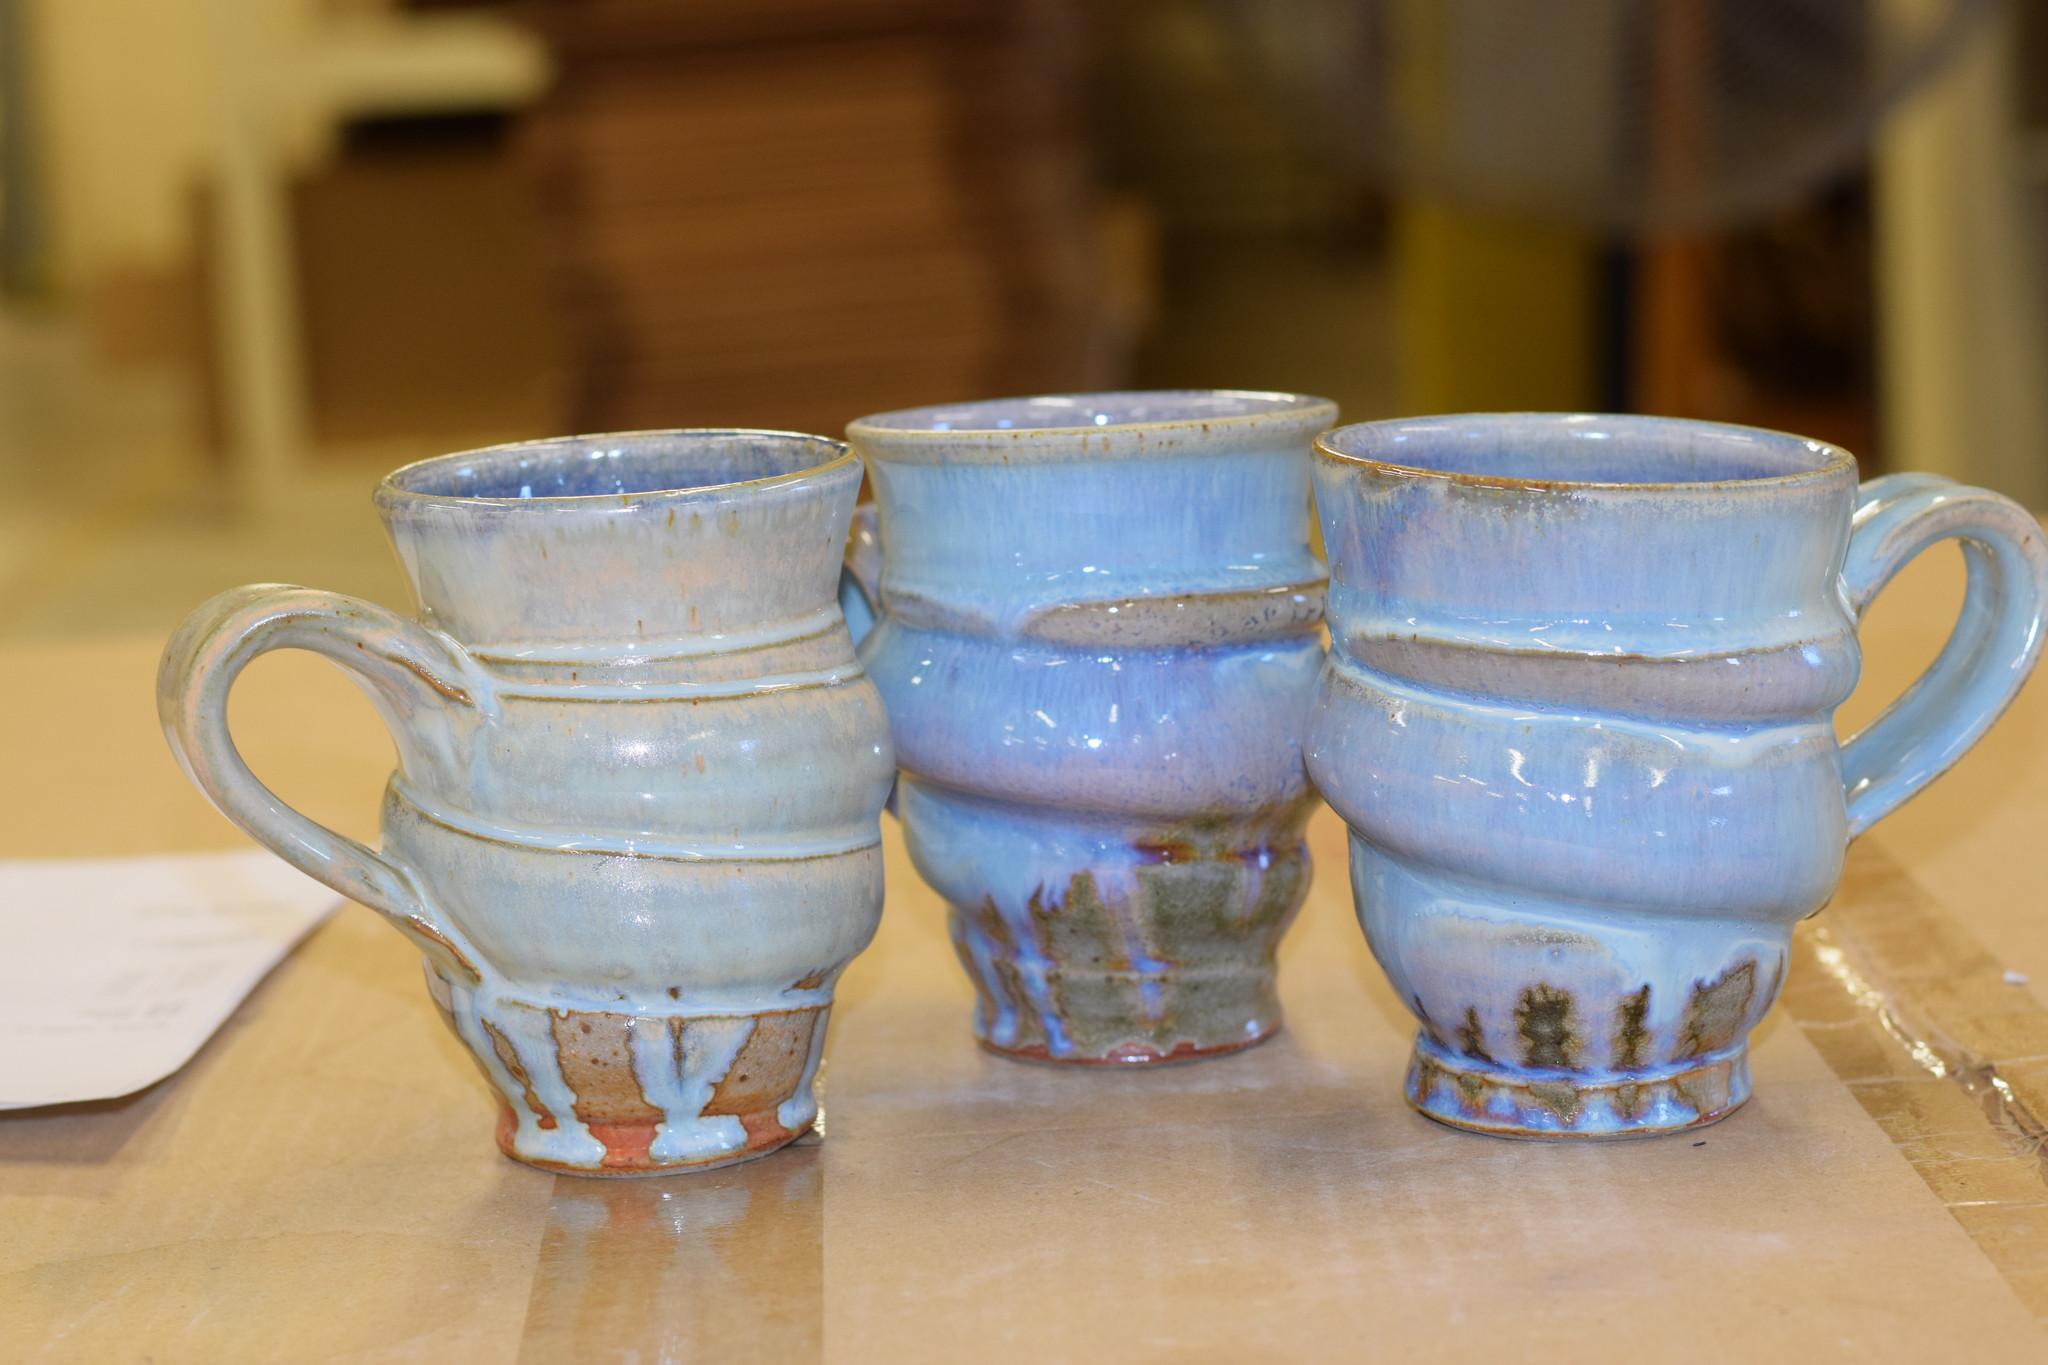 Berea College Crafts The Glade Mug